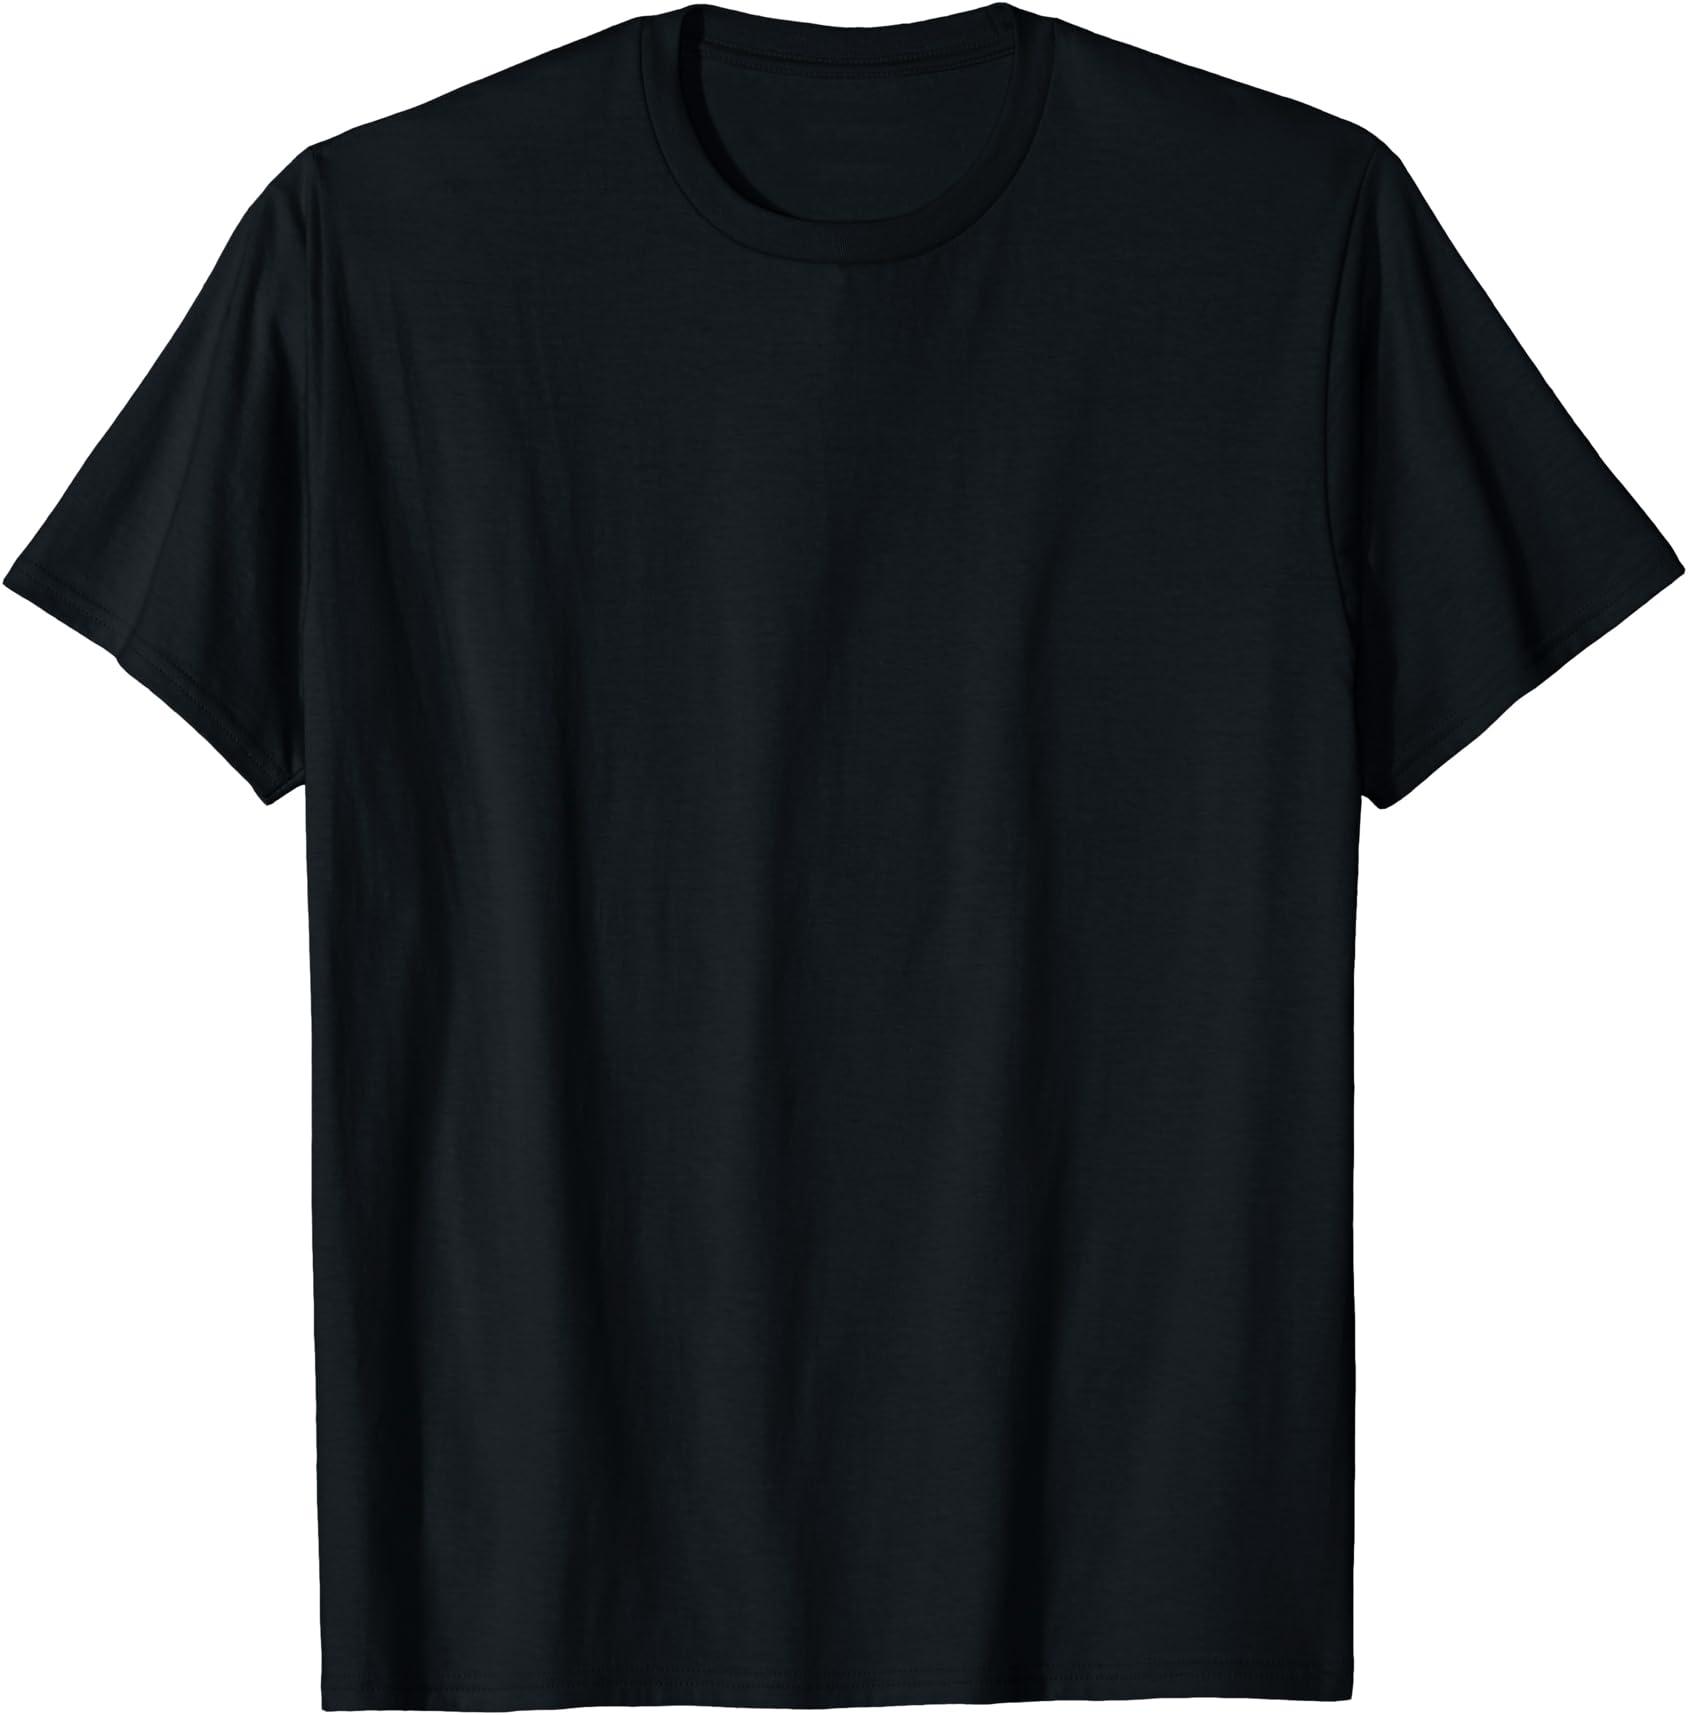 Ideal Gift//Birthday Present. Naughty But Nice Mens Christmas T-Shirt